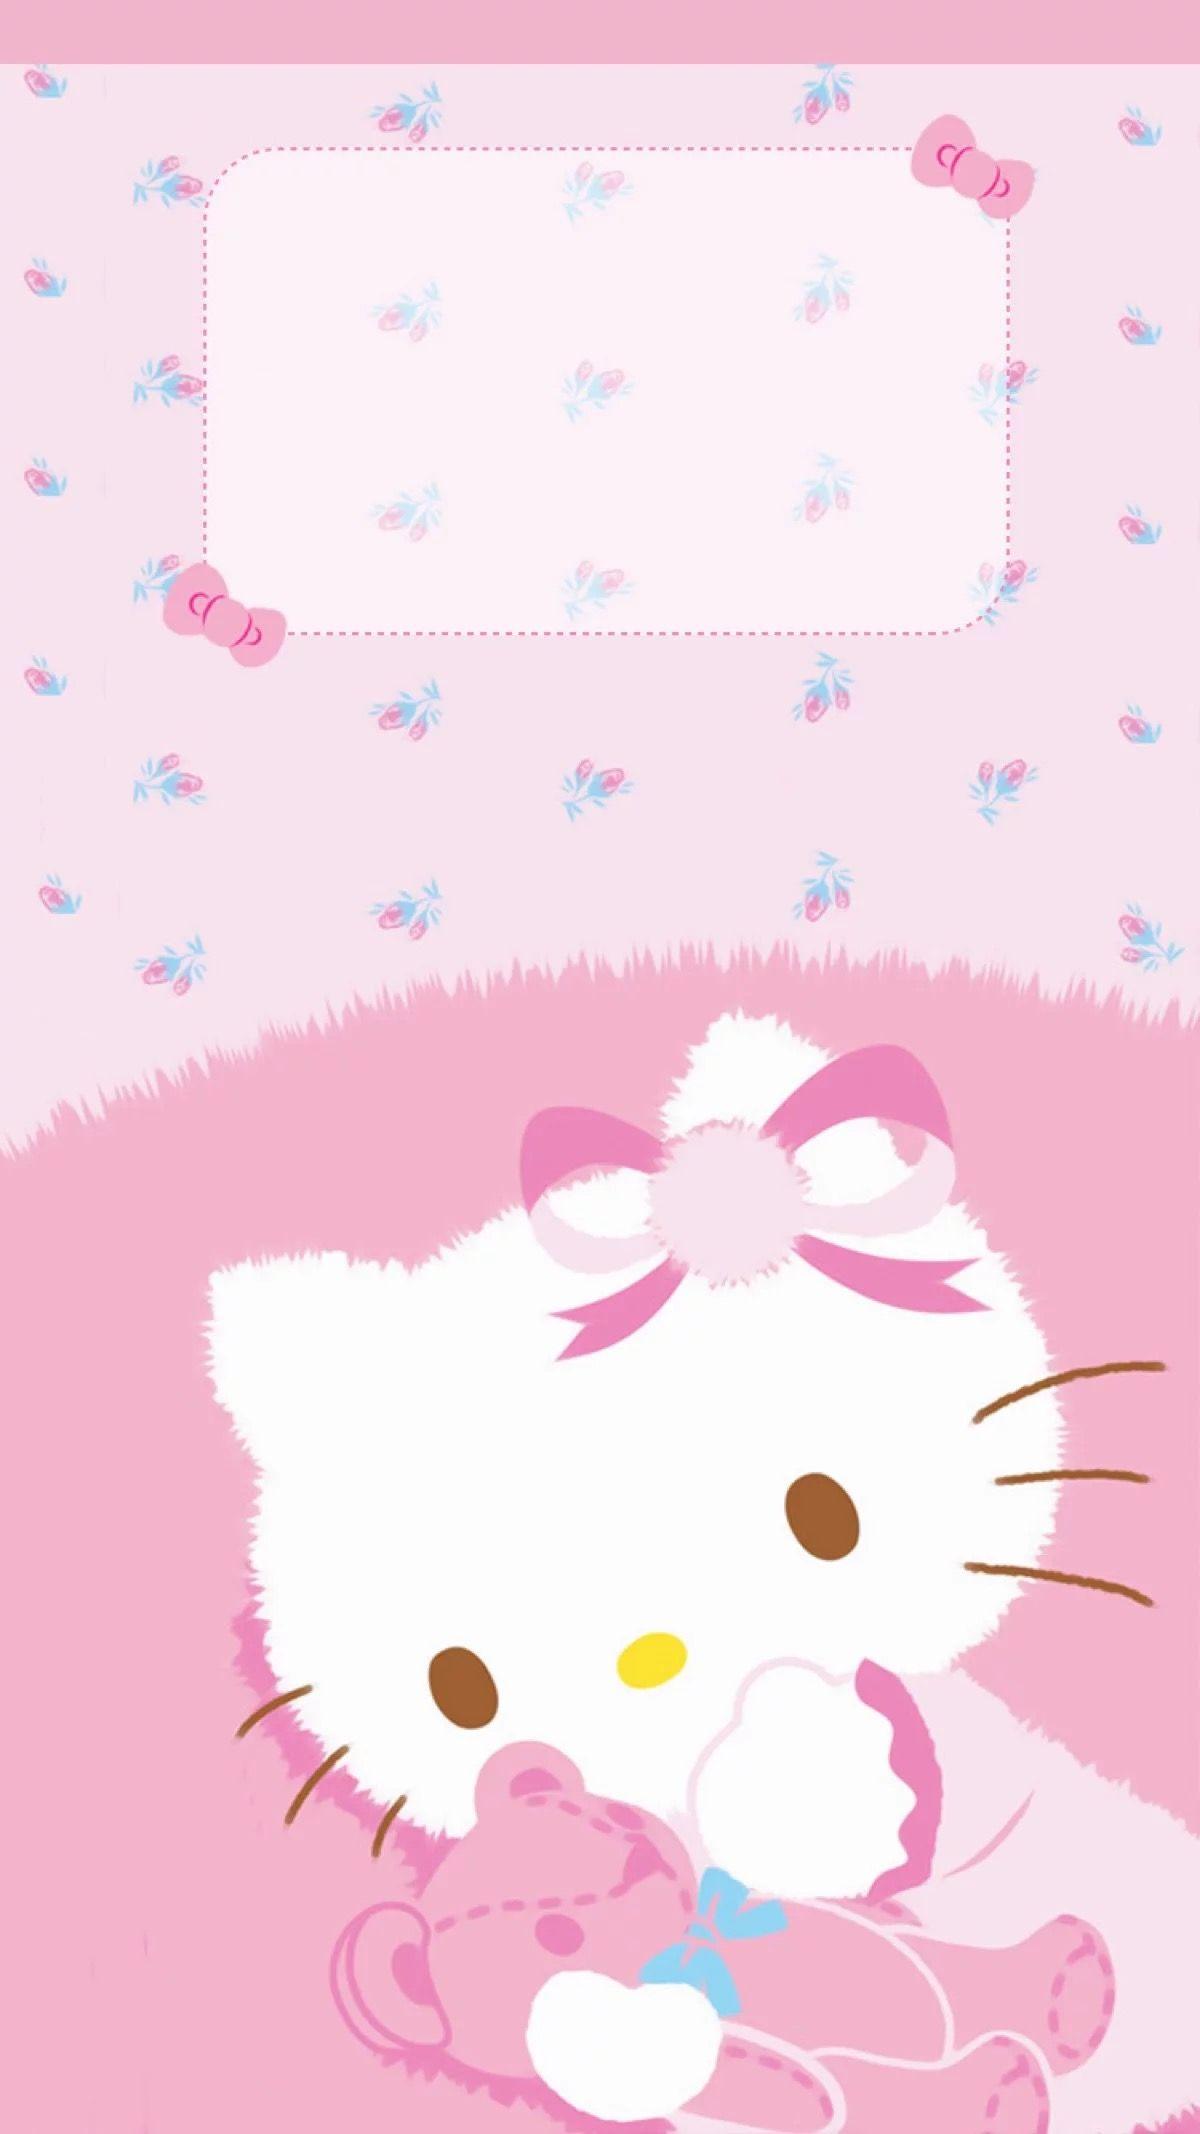 Fantastic Wallpaper Hello Kitty Bear - 1800ffe4b0cc980b4ad324a18c03461d  Snapshot_69932.jpg